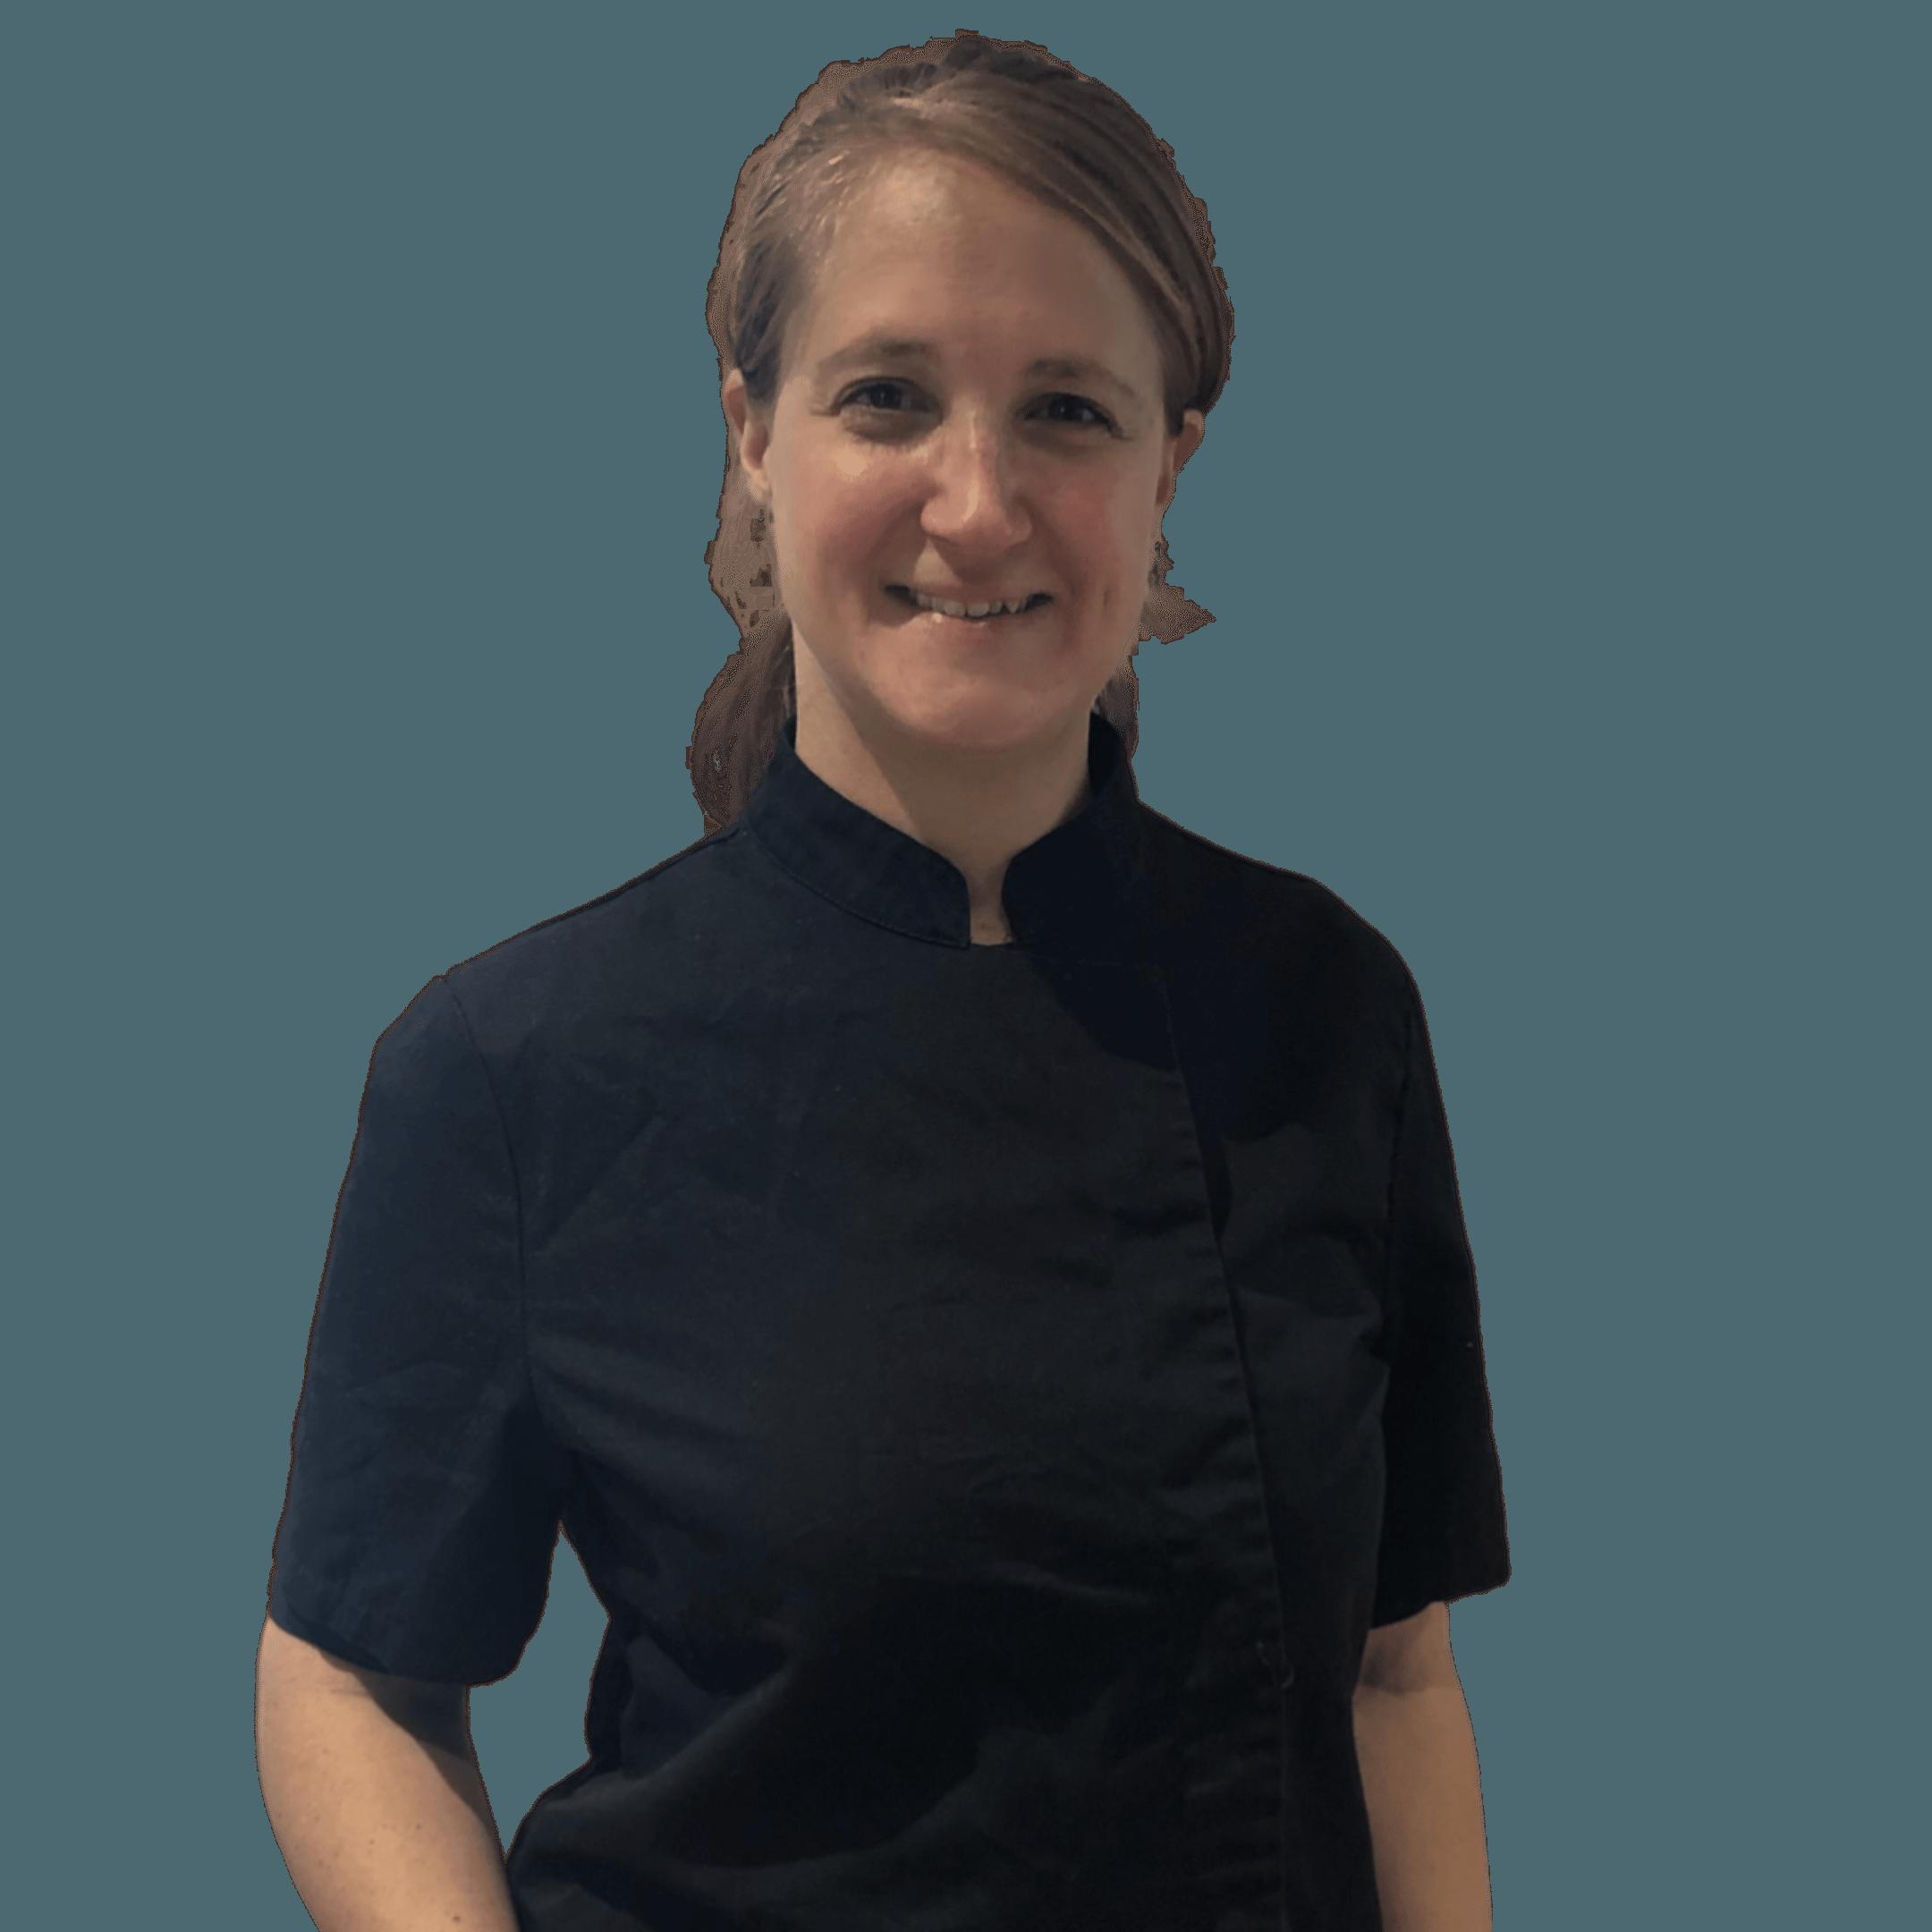 Alexandra Cozlin Les Gourmandises d'Alex client Marwee consultant marketing web Cruseilles